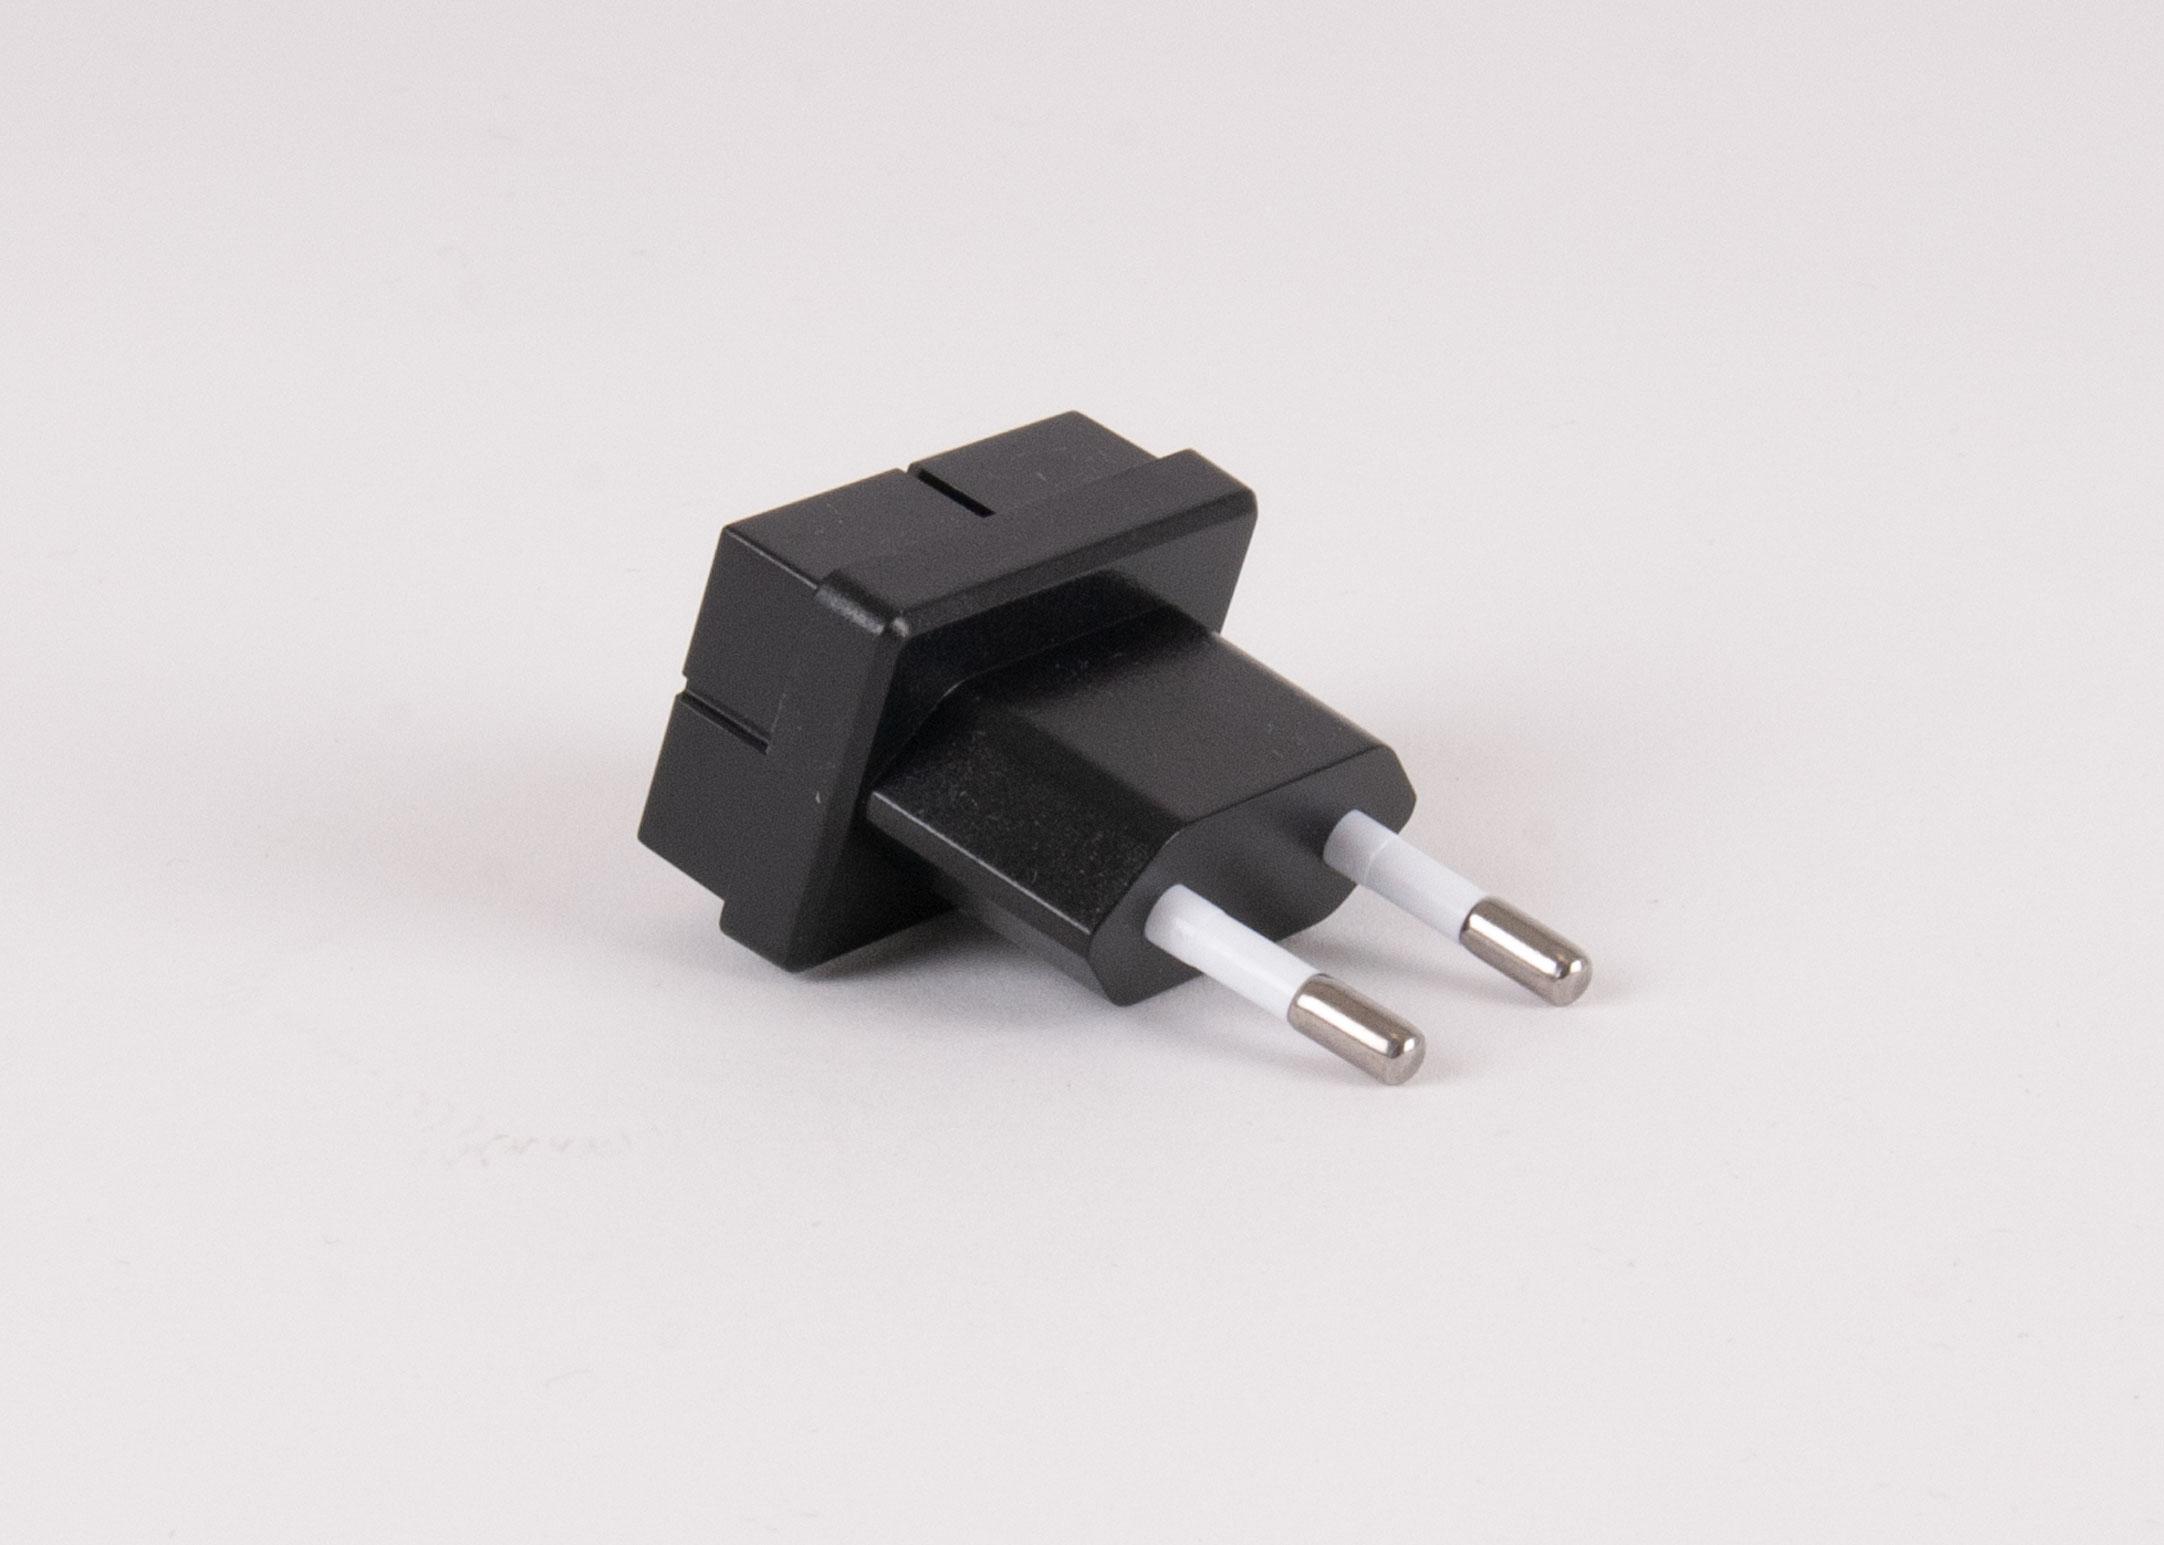 Heiniger Adaptor EU Plug - NEW